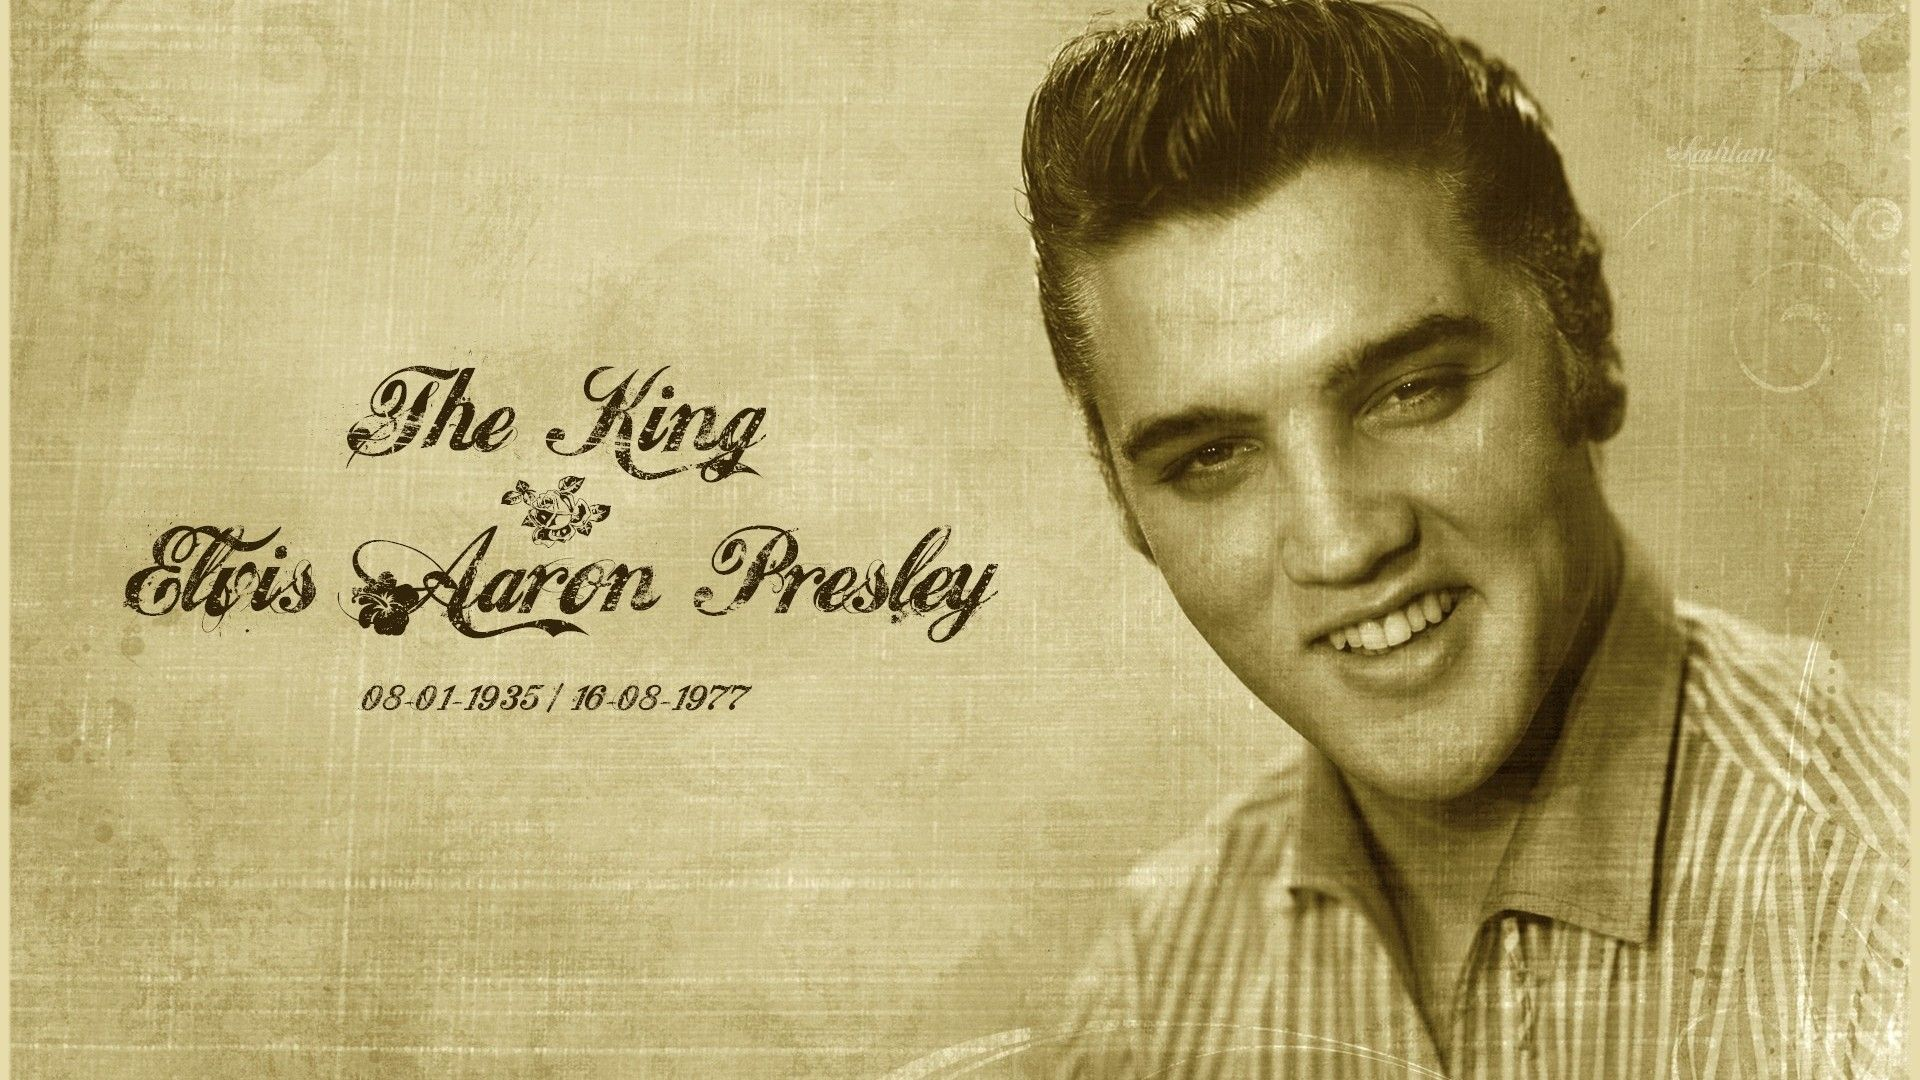 Image Gallery Elvis Presley Wallpaper Hd For Desktop Music Elvis Presley Wallpaper Elvis Presley Pictures Elvis Presley